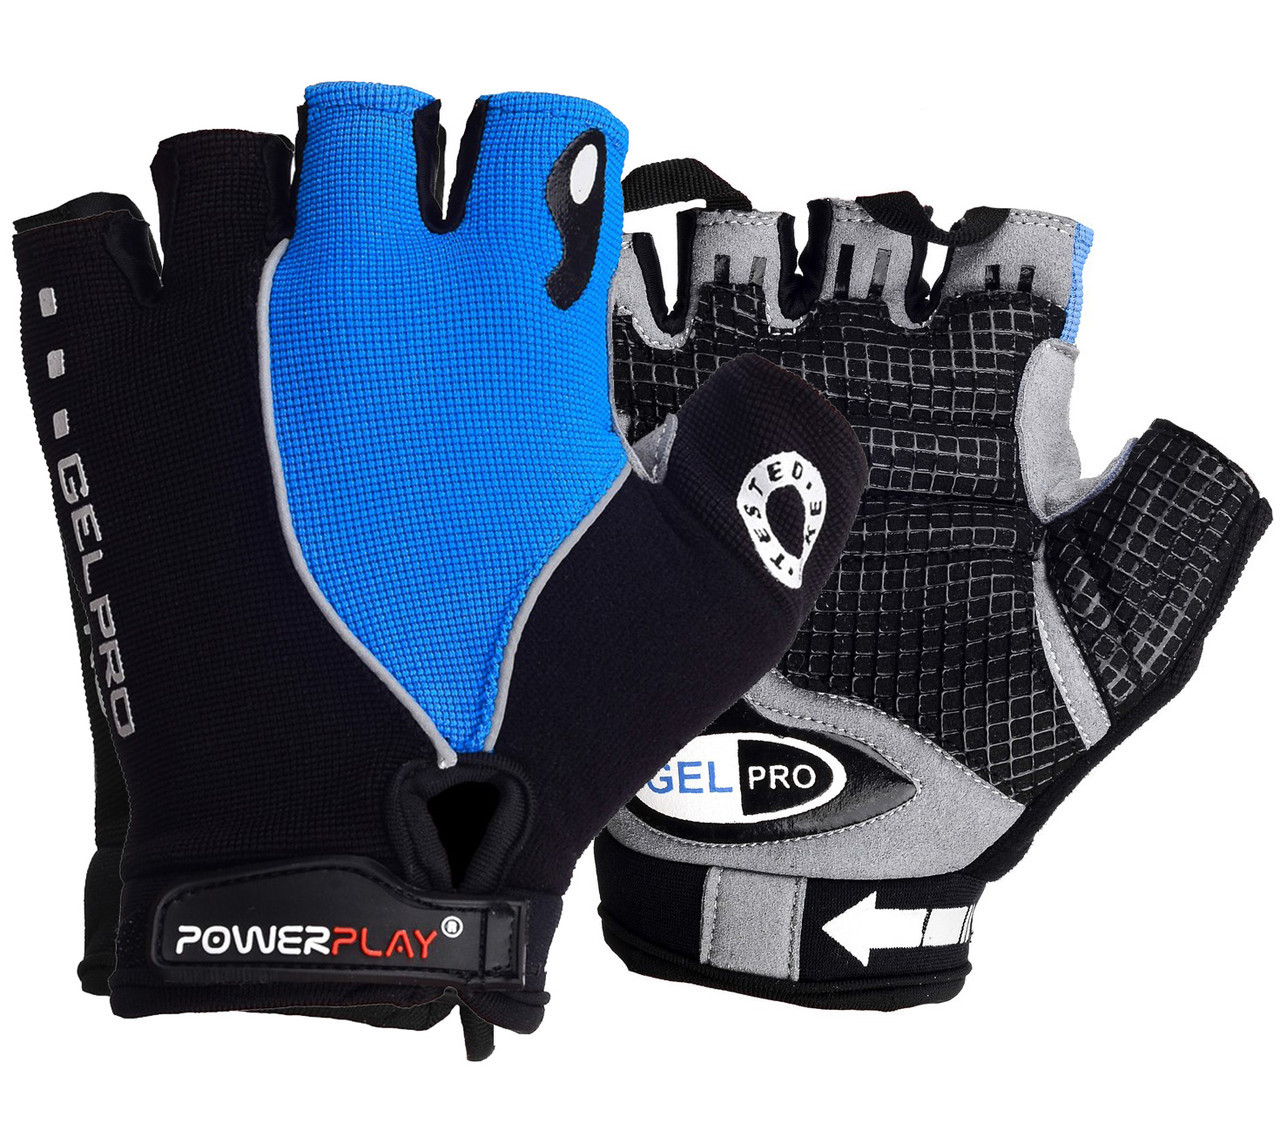 Велорукавички PowerPlay 5019 C Чорно-блакитні S